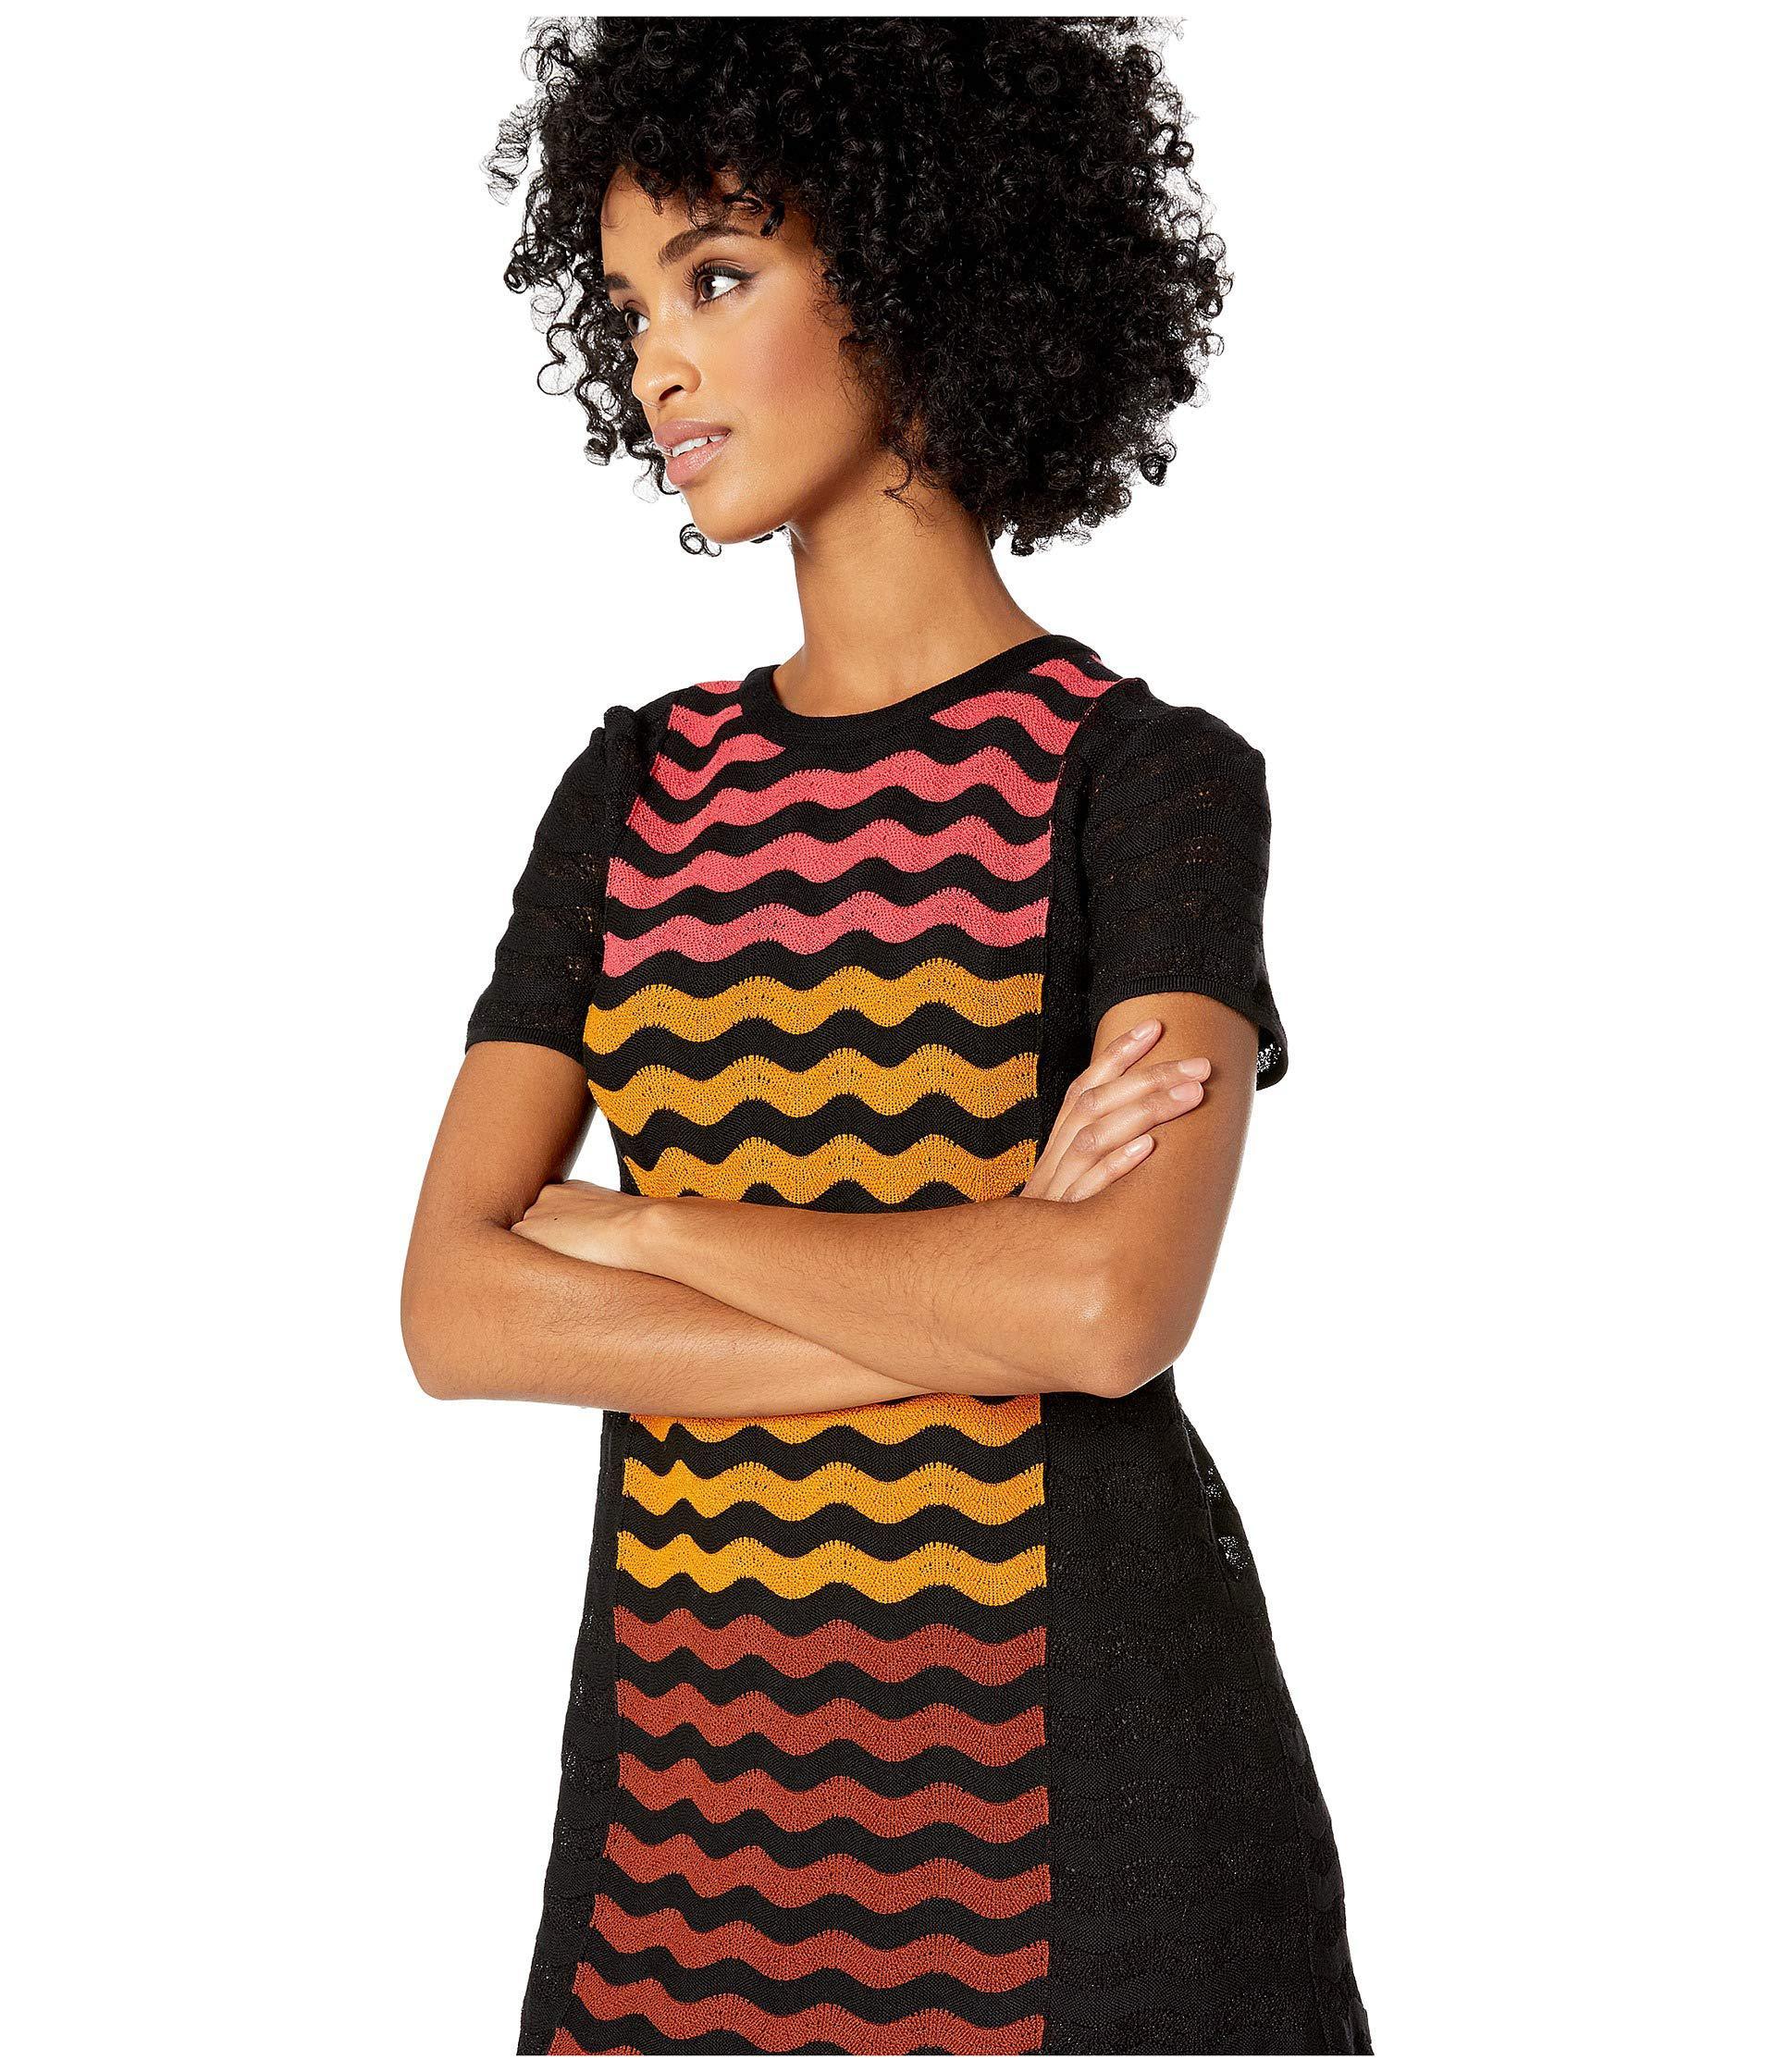 cb5447e139c9a9 M Missoni - Ripple Intarsia Short Sleeve Dress (black) Women s Dress -  Lyst. View fullscreen